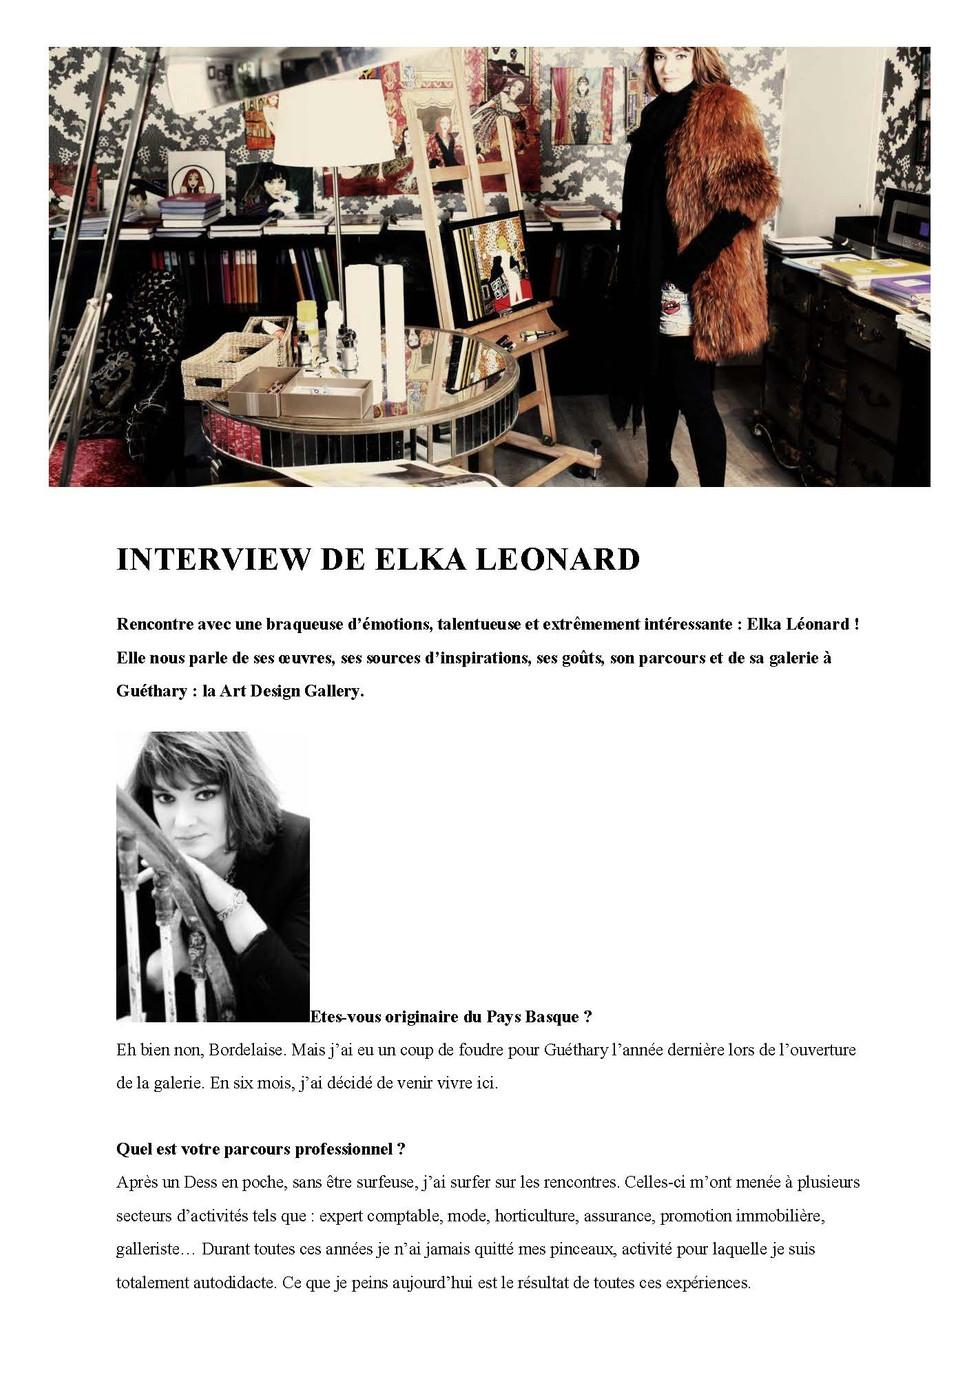 Interview_de_Elka_Léonard._Page_1.jpg